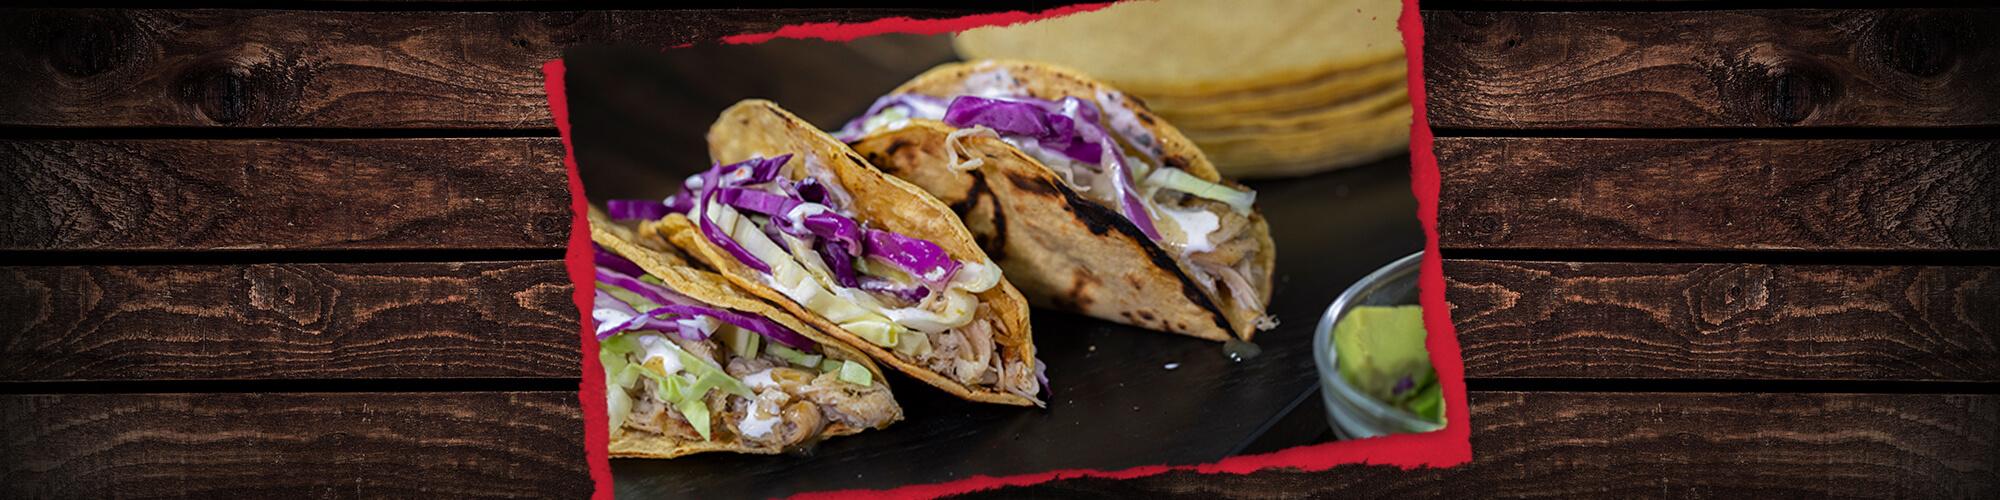 Salsas easy slow cooker spicy chicken verde tacos